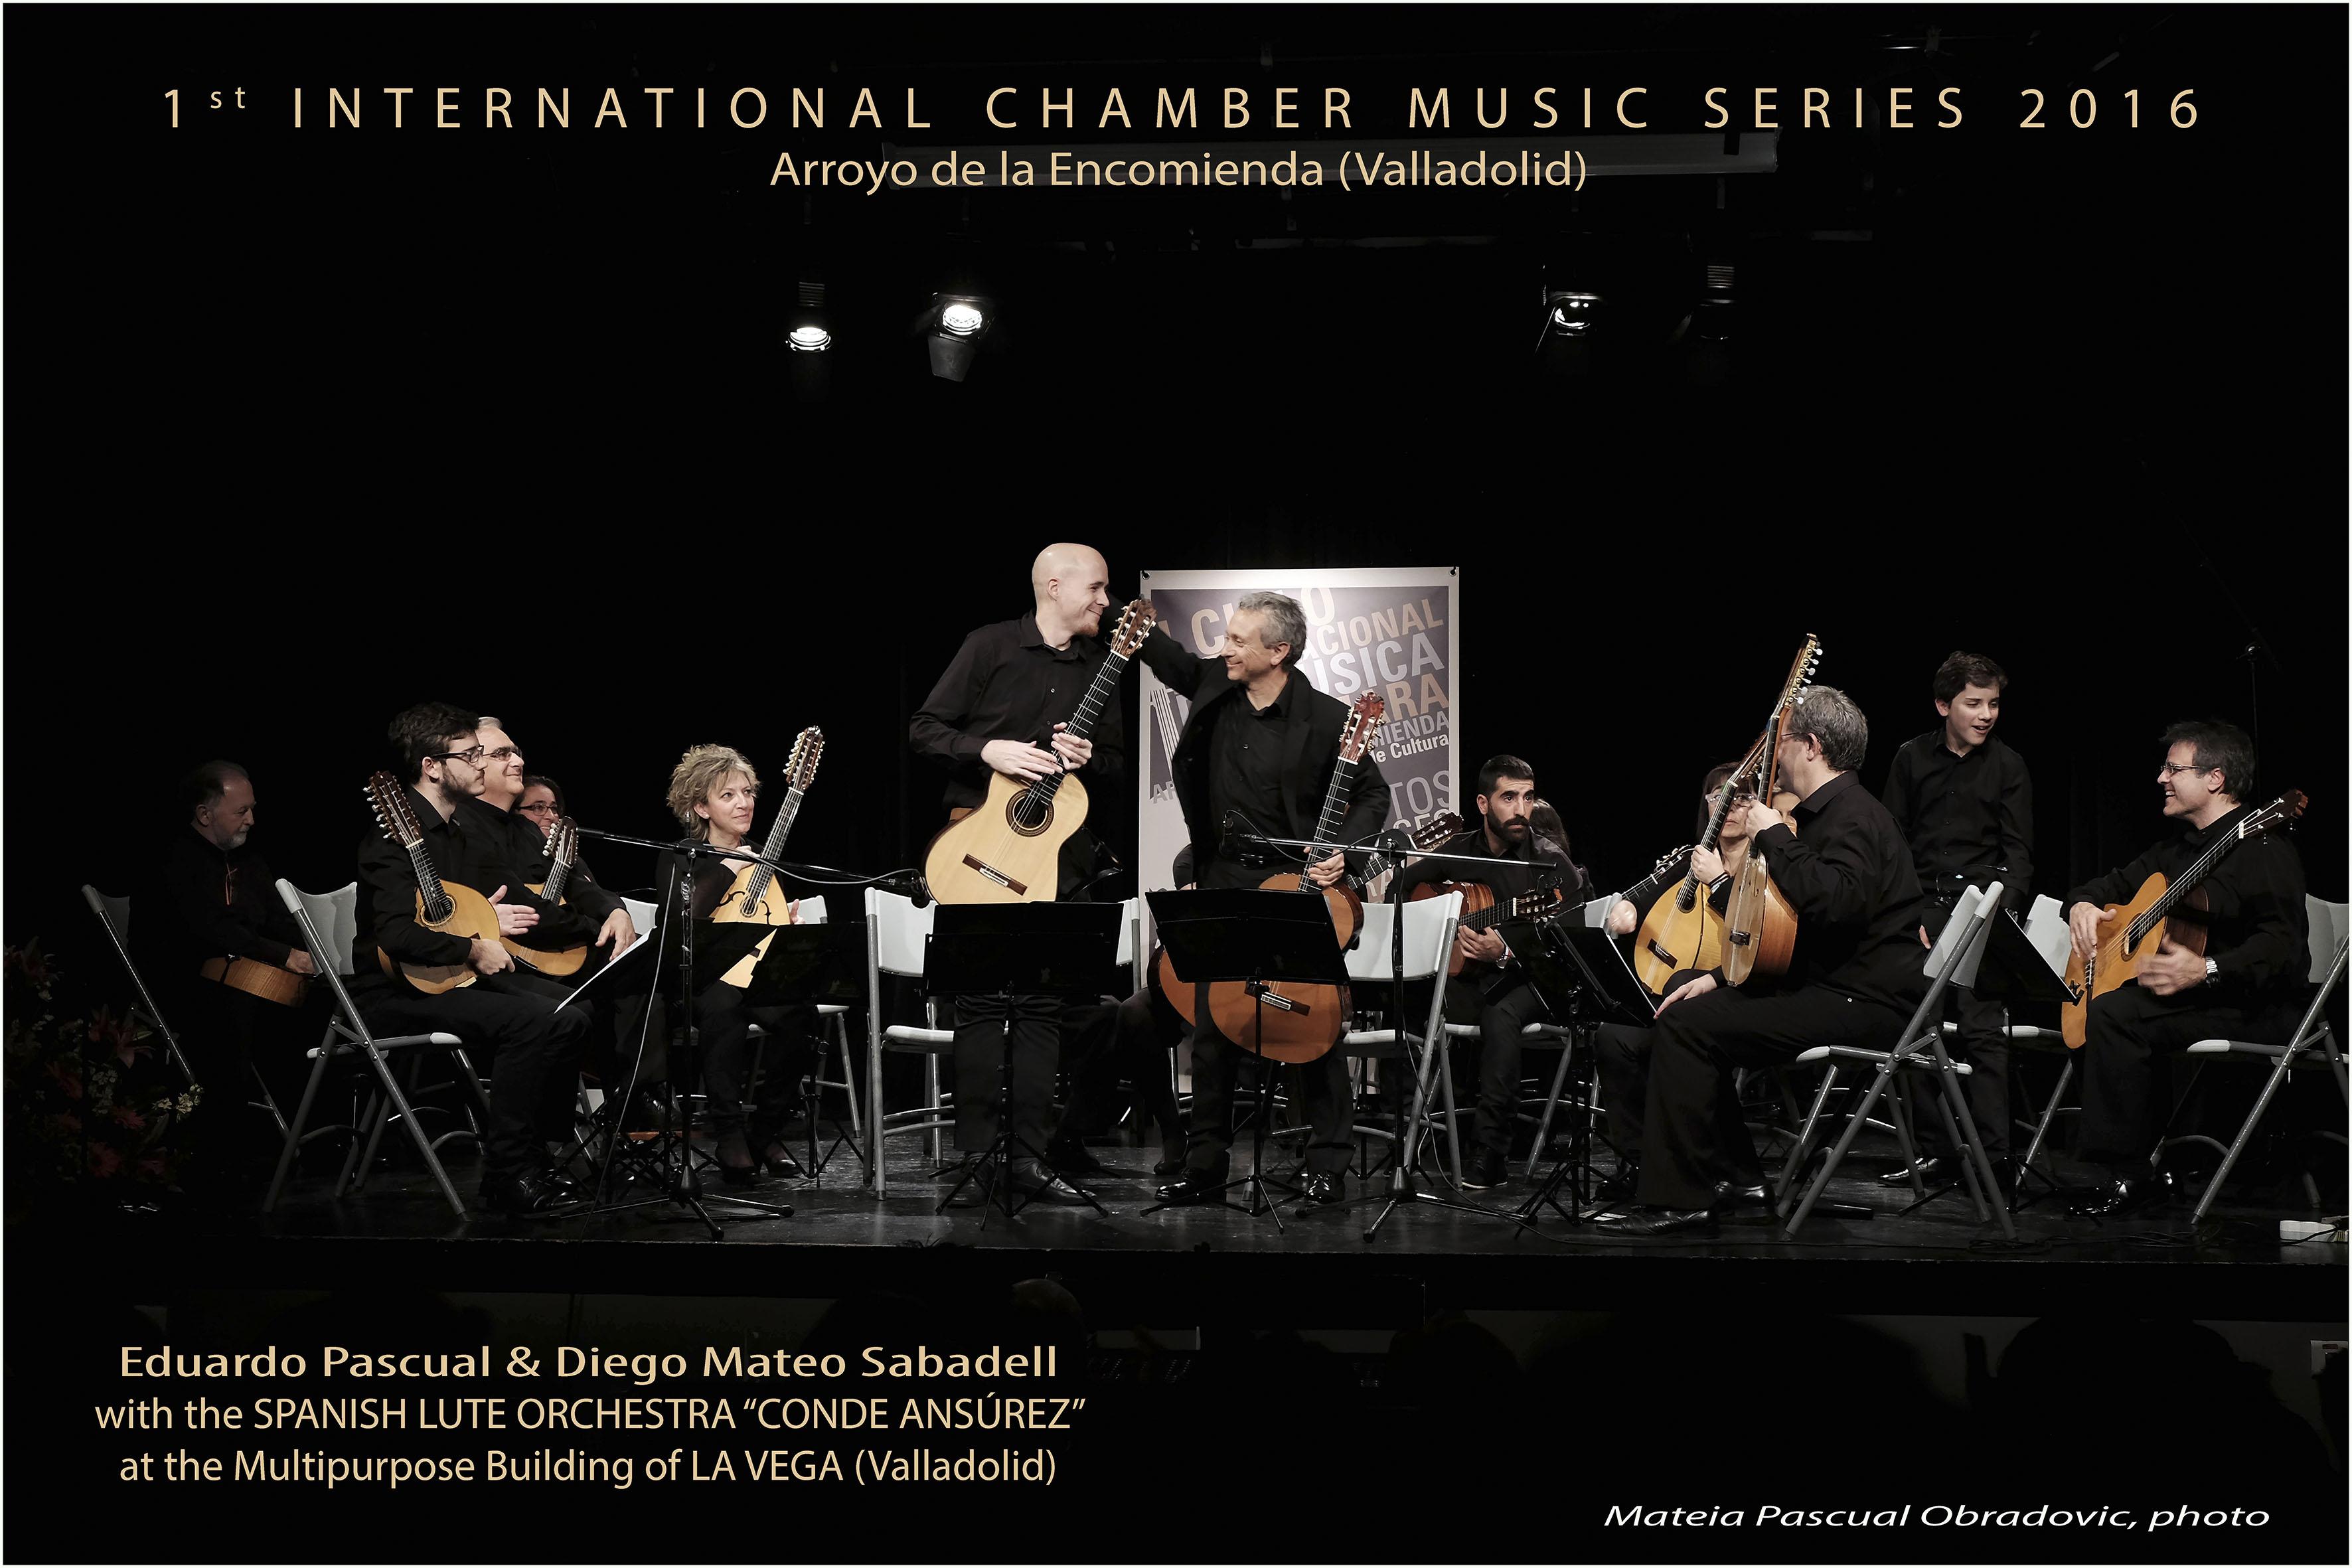 I International Chamber Music Series of Arroyo de la Encomienda